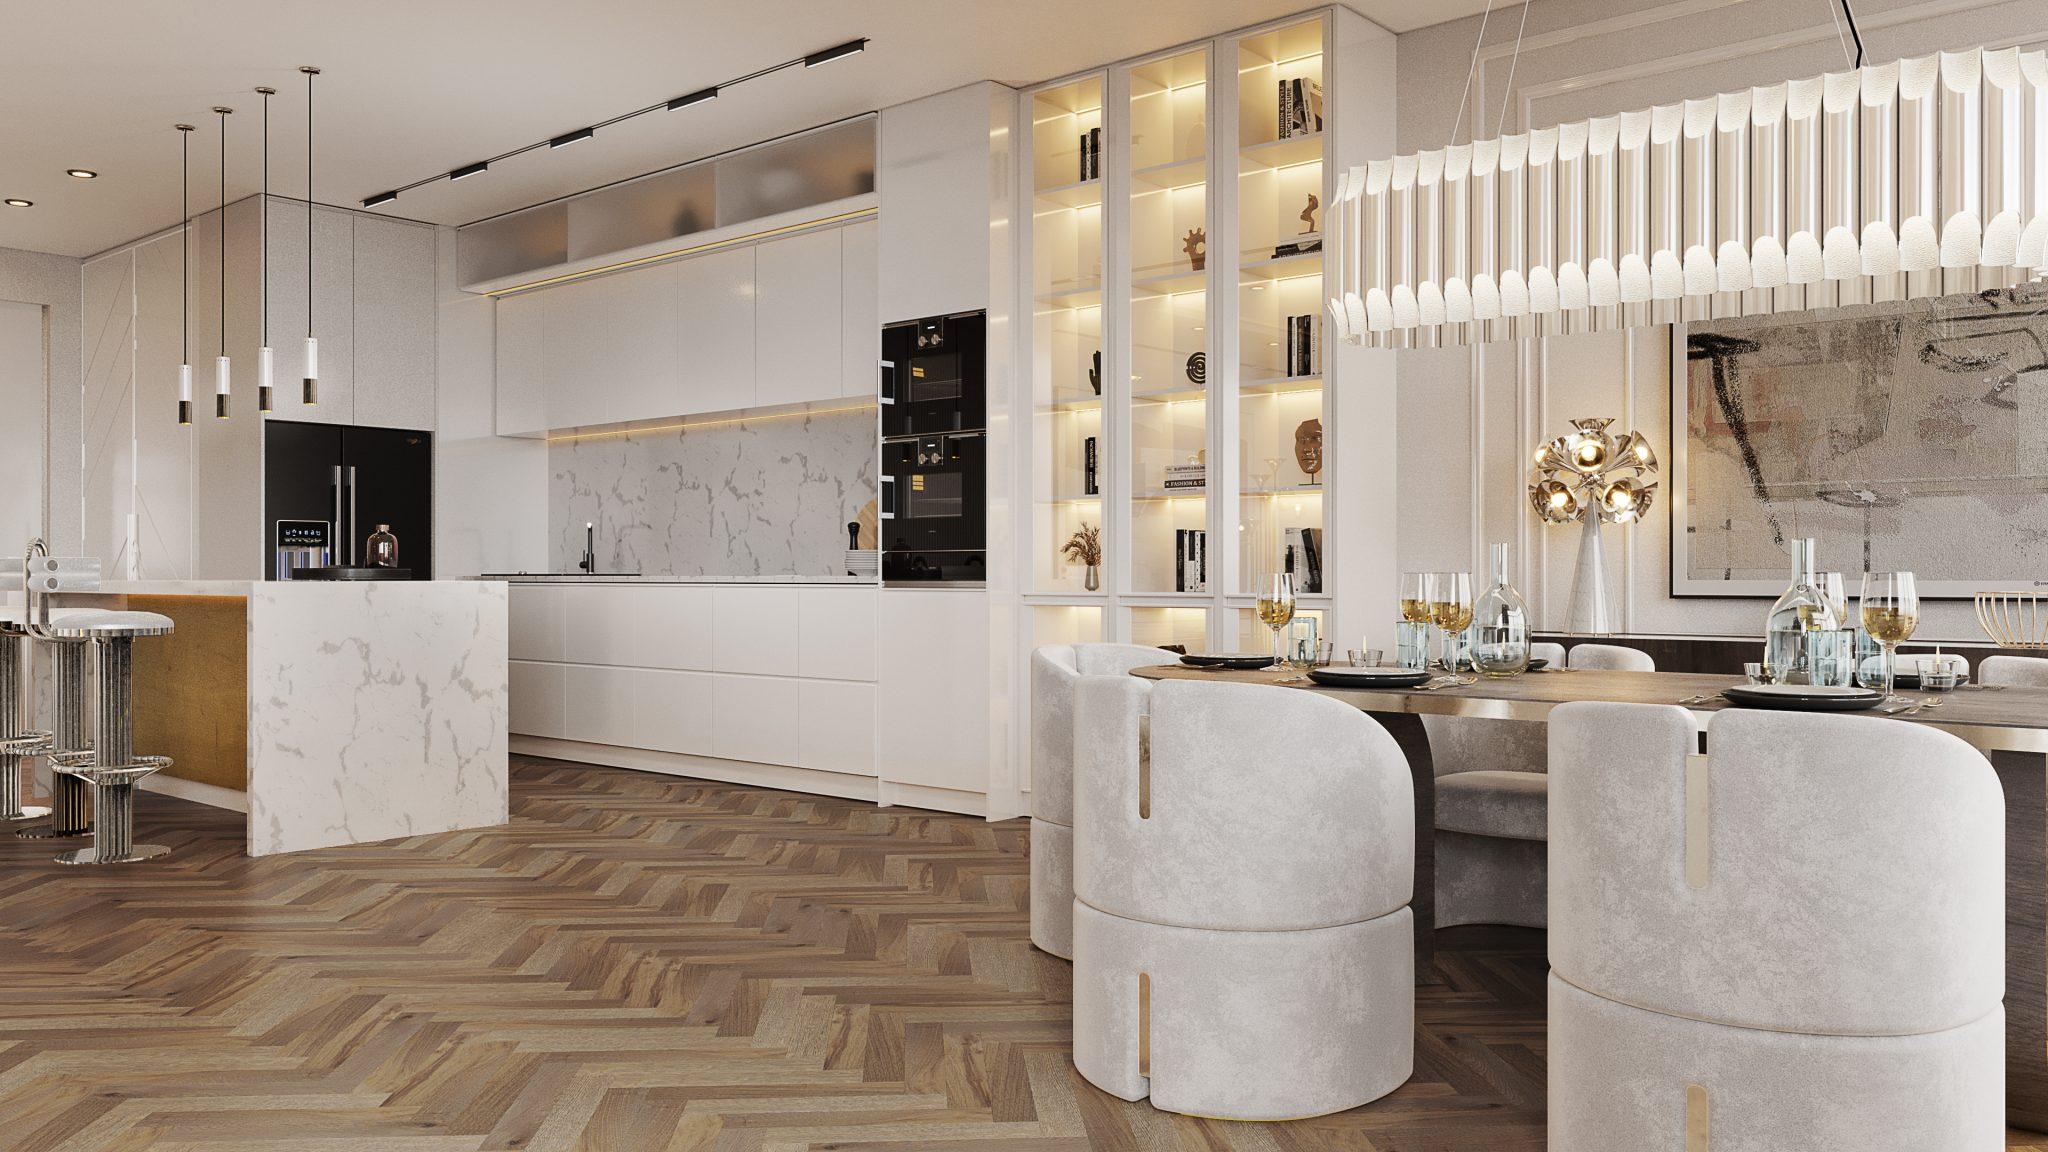 Unique Kitchen Designs For Mid-Century Modern Lovers